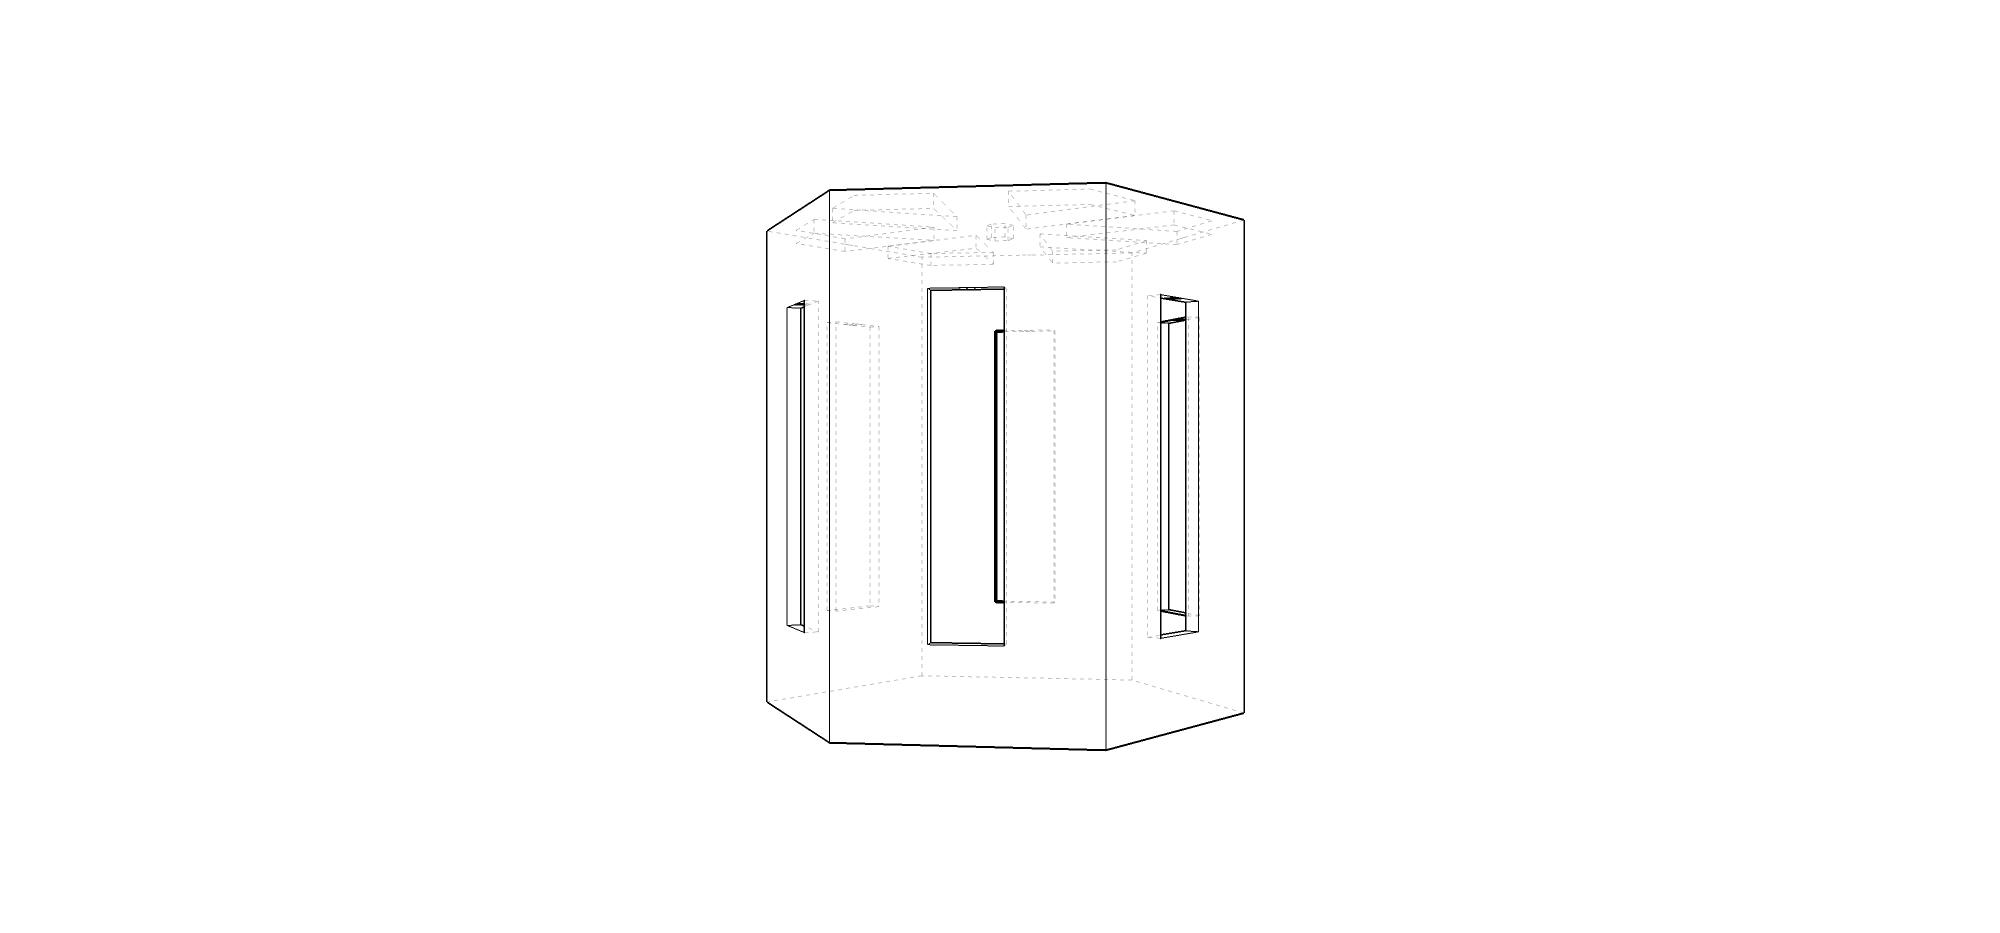 3 - Hexagon Seating Element C.jpg